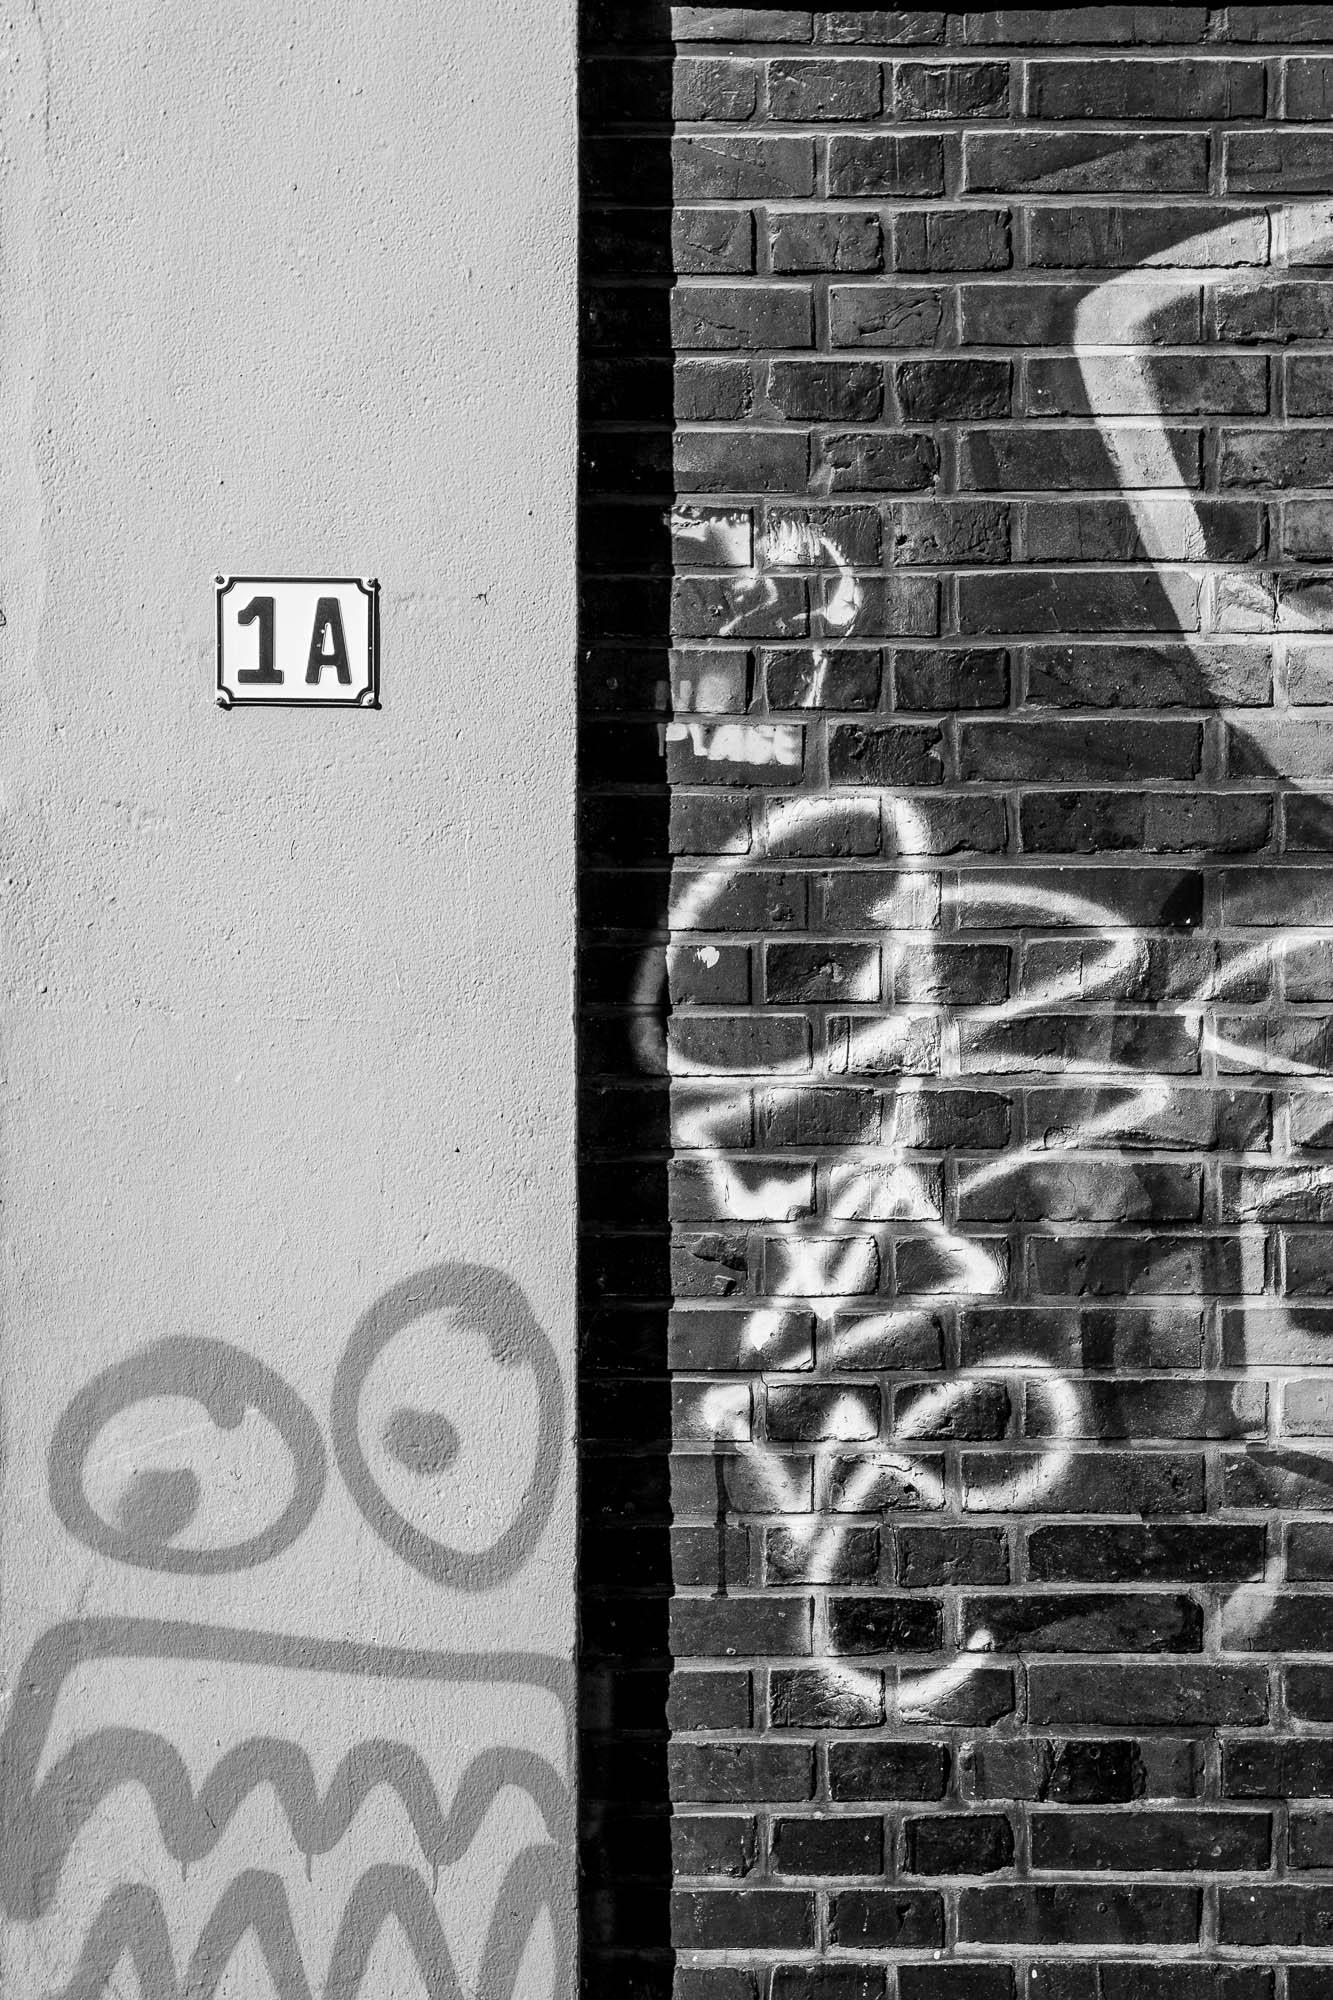 1a Graffiti